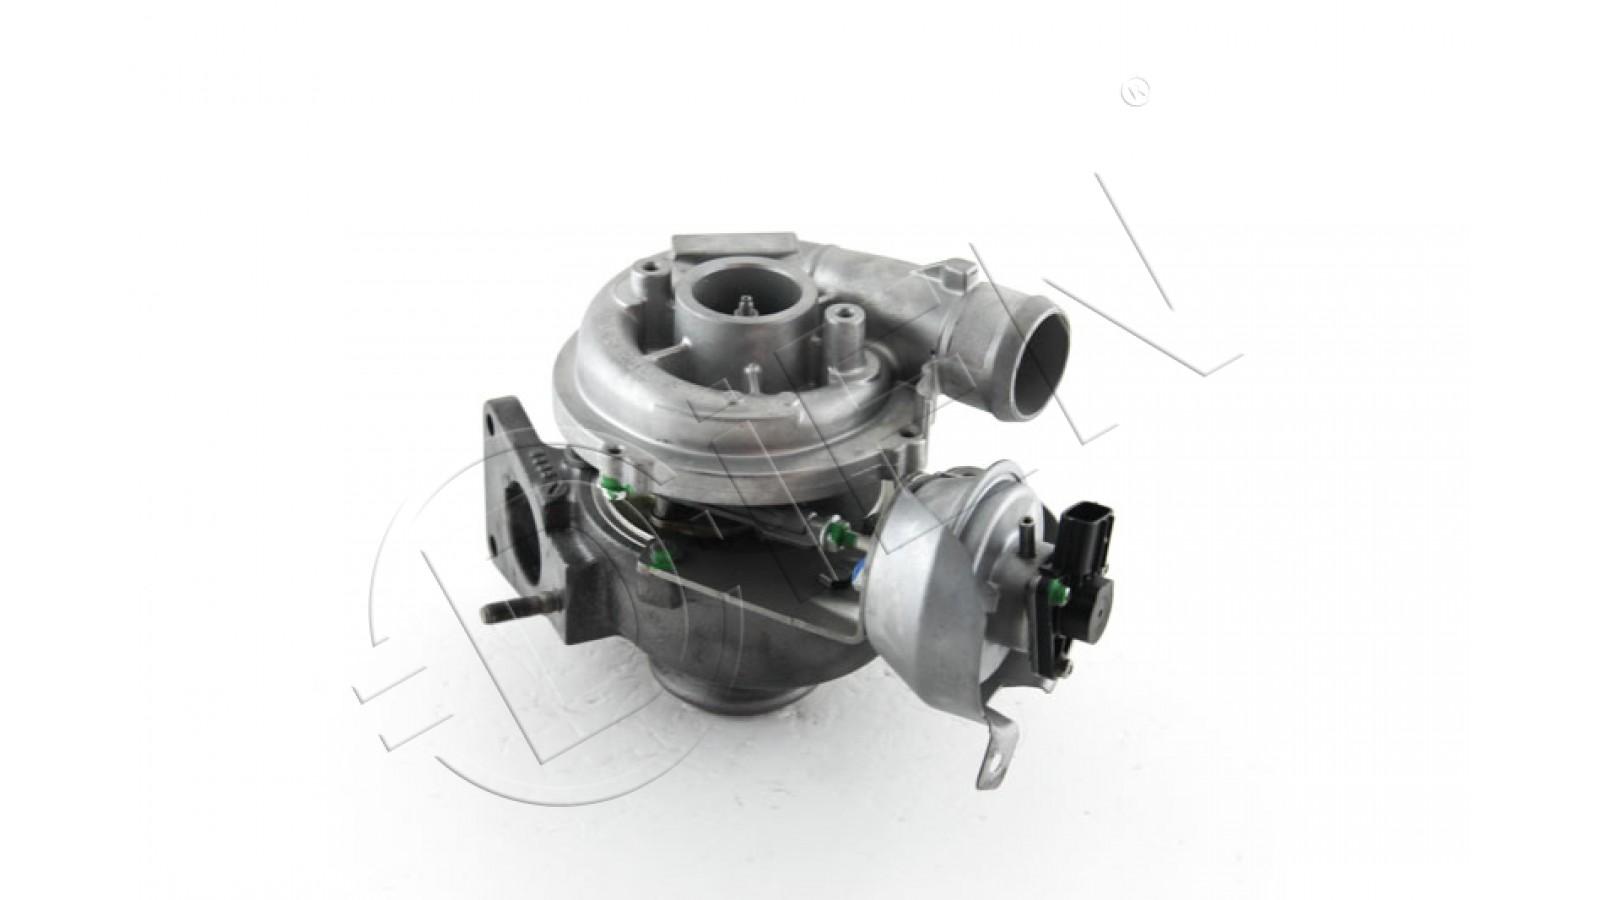 Turbocompressore  VOLVO  C30  2.0 D  136Cv  1998ccm  ott 2006 - dic 2012